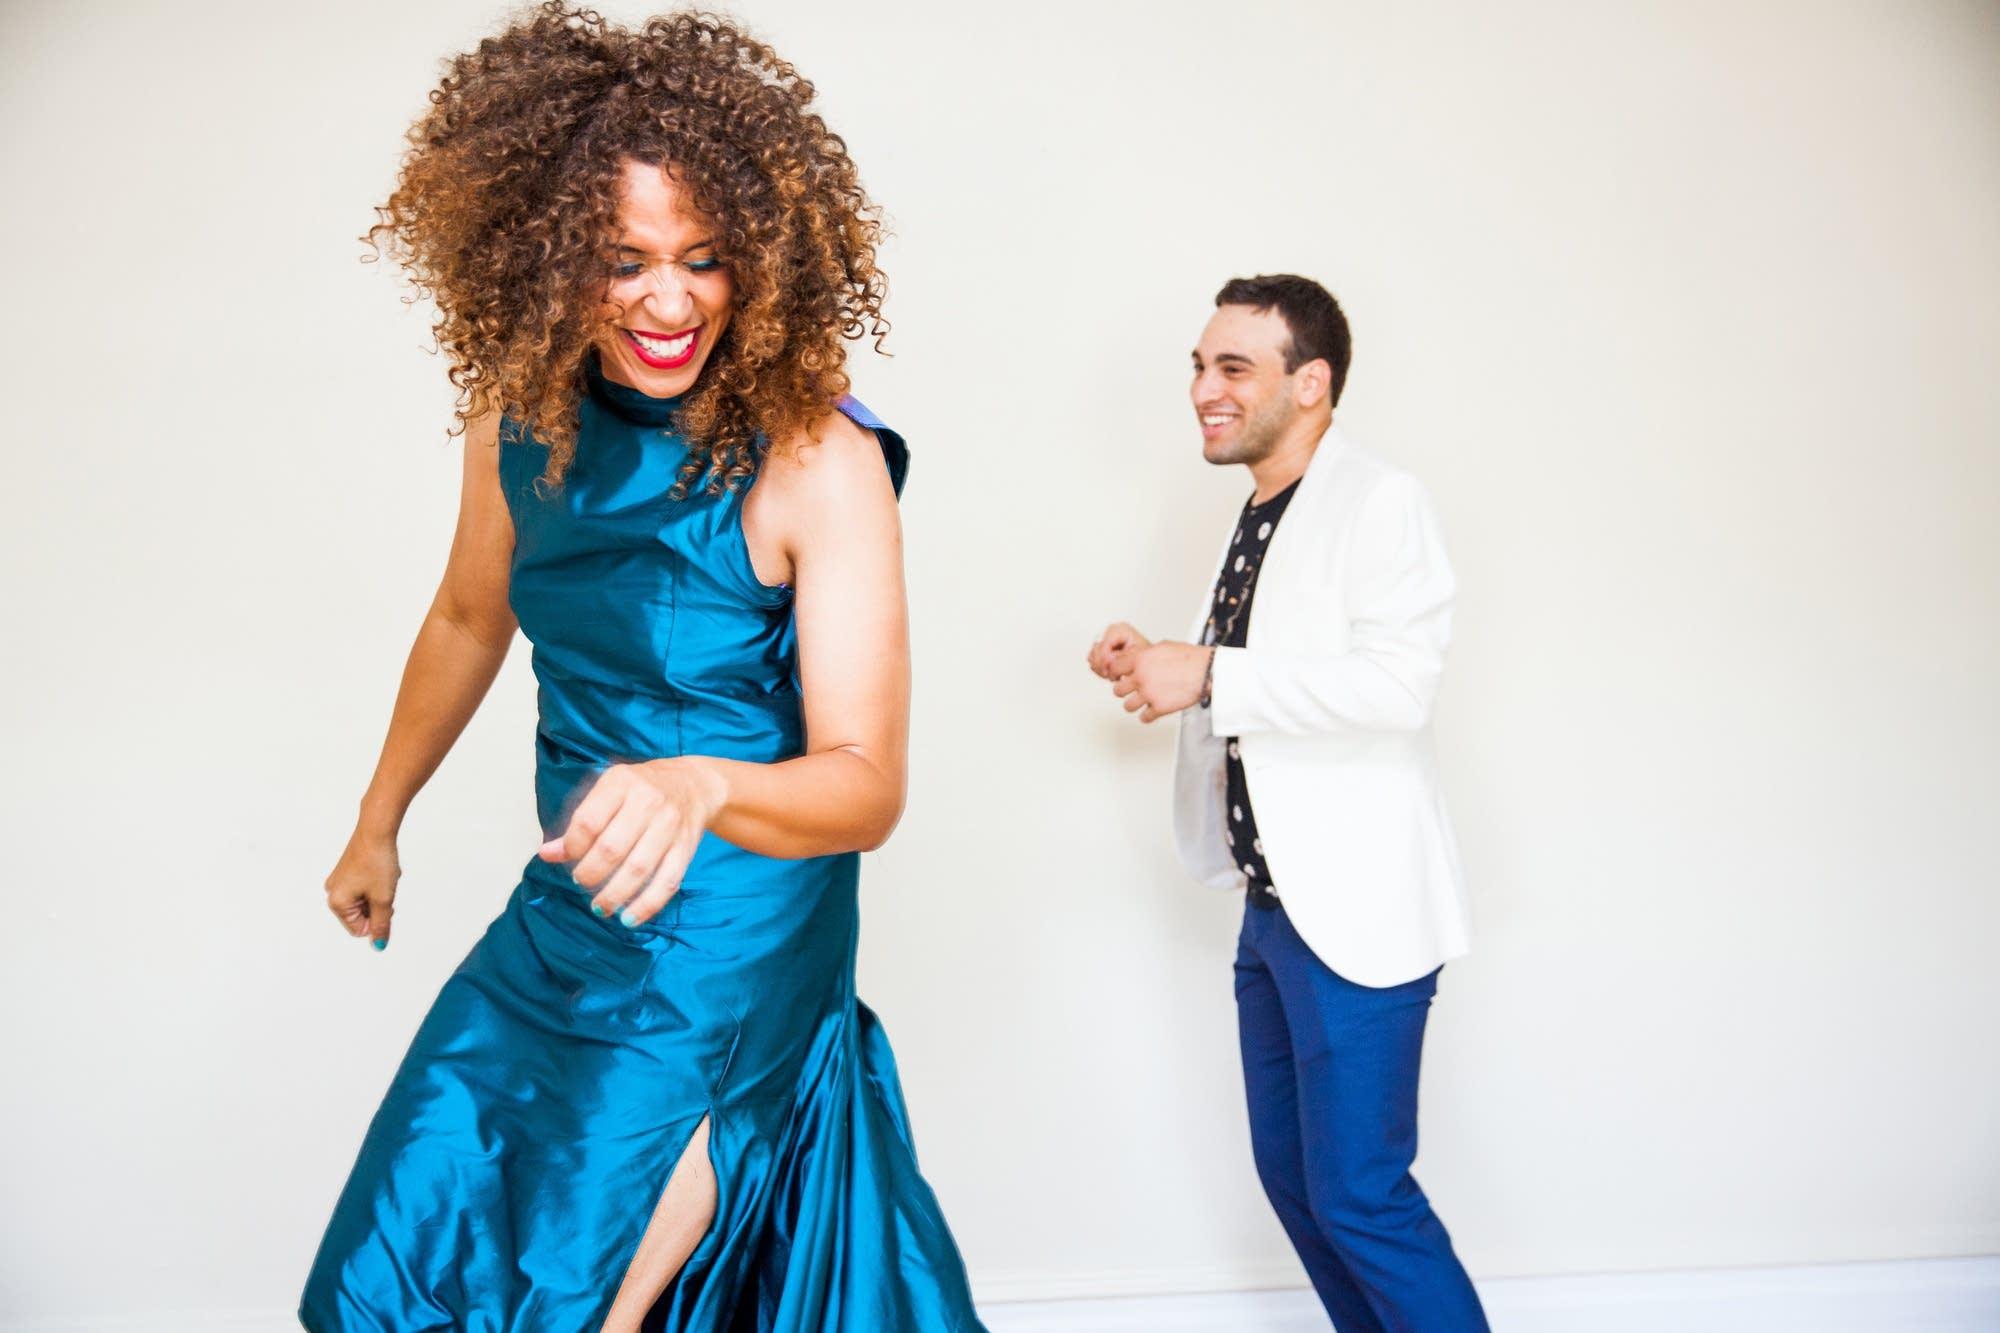 Jomama Jones and bandmate Samora Pinderhughes